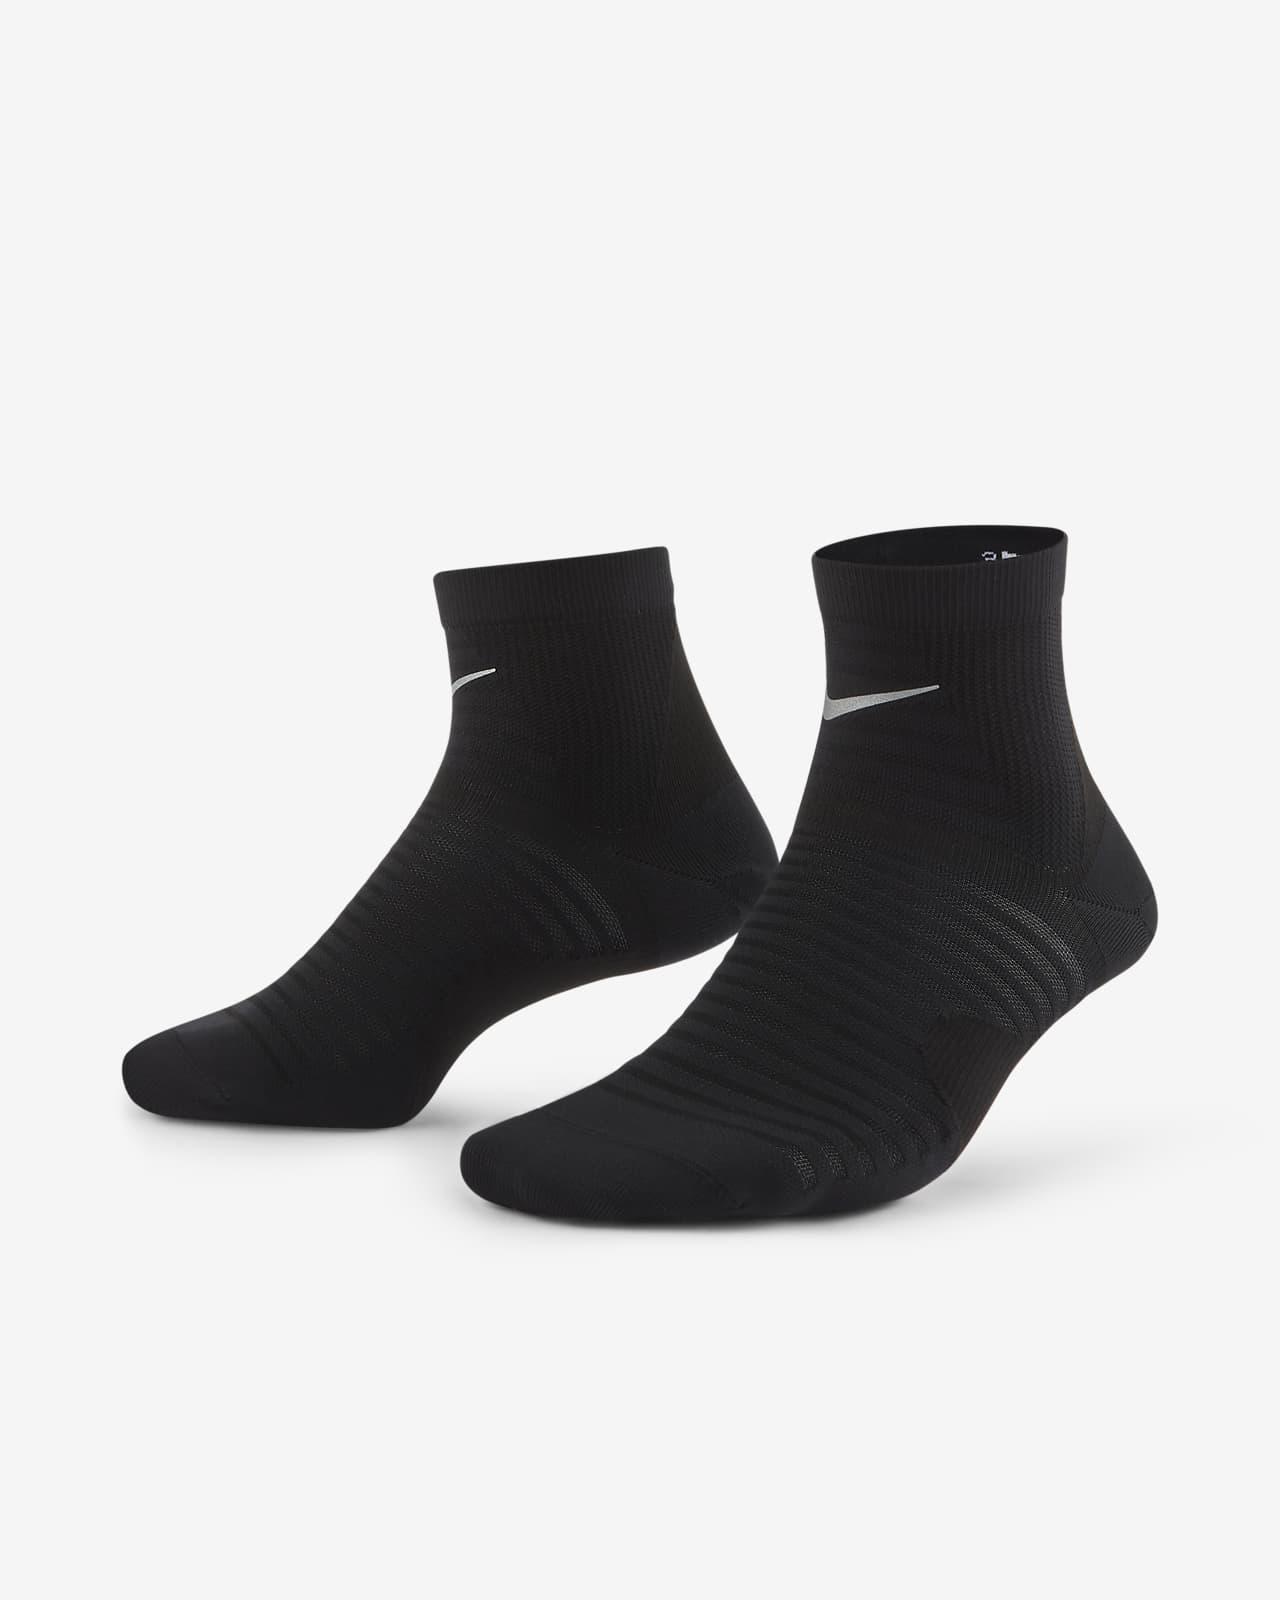 Socquettes de running Nike Spark Lightweight